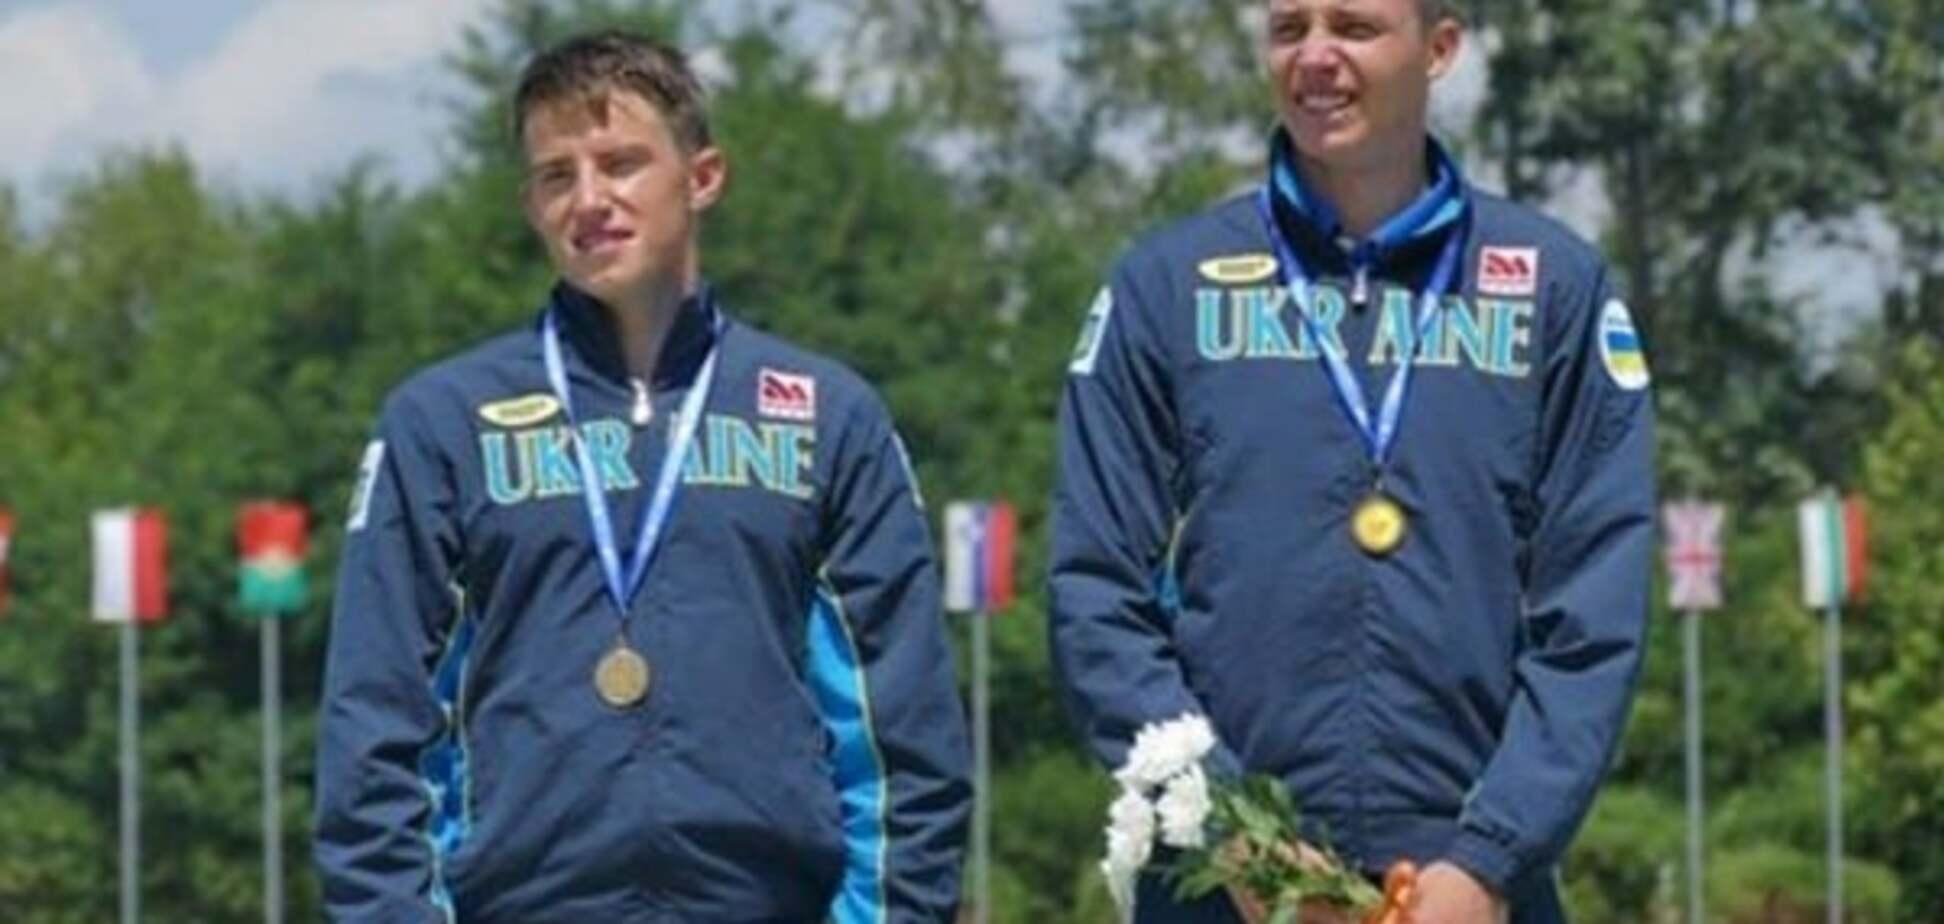 Юрий Вандюк и Андрей Рыбачок